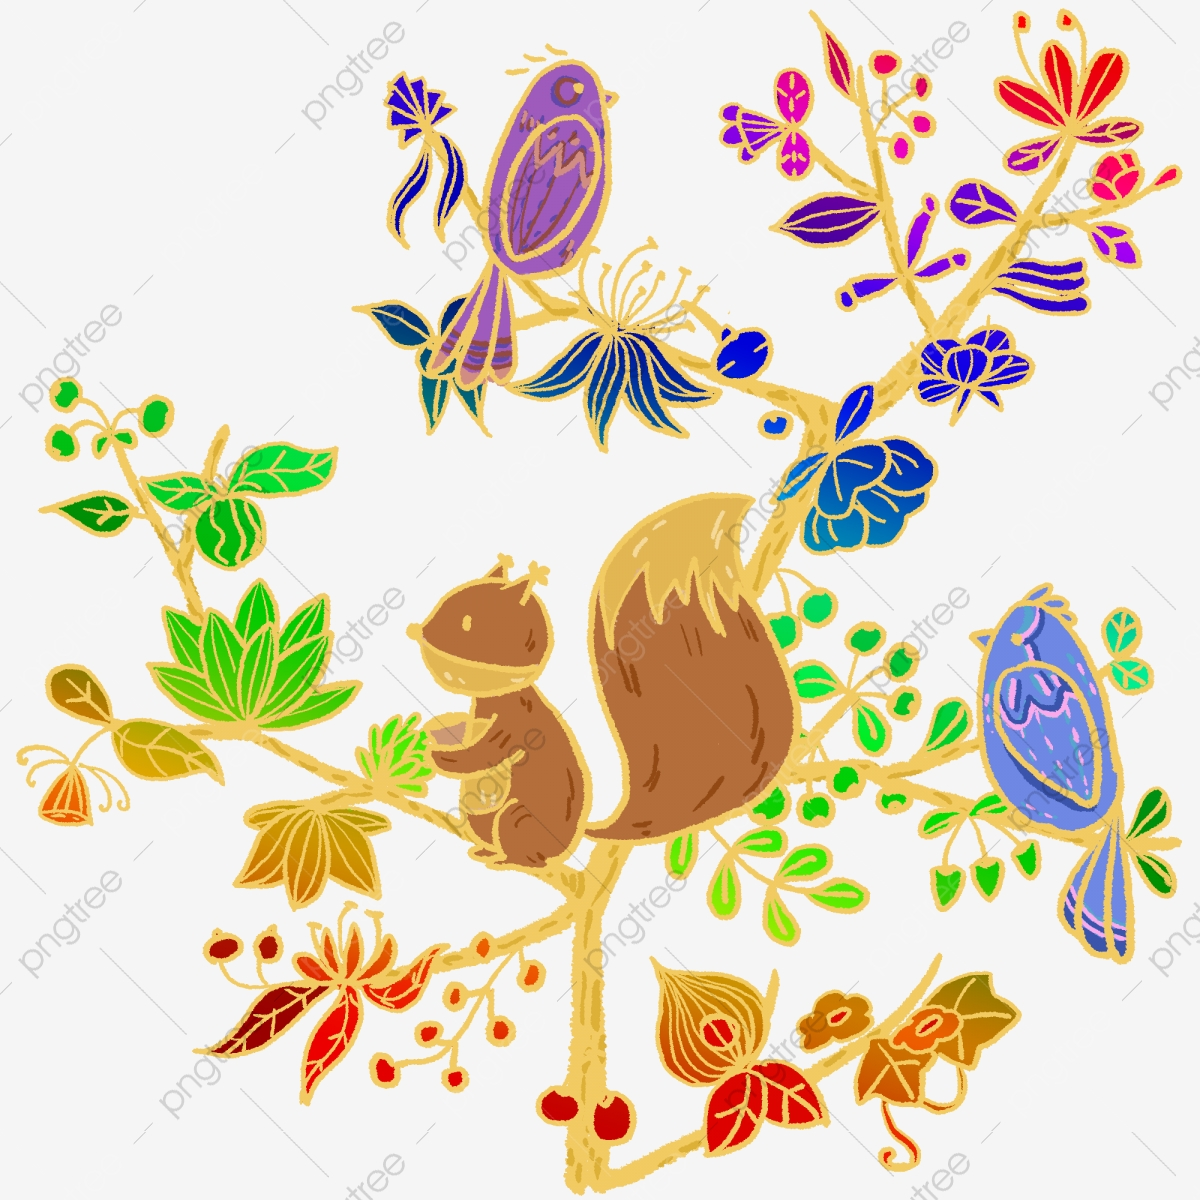 Kathy Robertson - Secret Squirrel Cartoon - Free Transparent PNG Clipart  Images Download